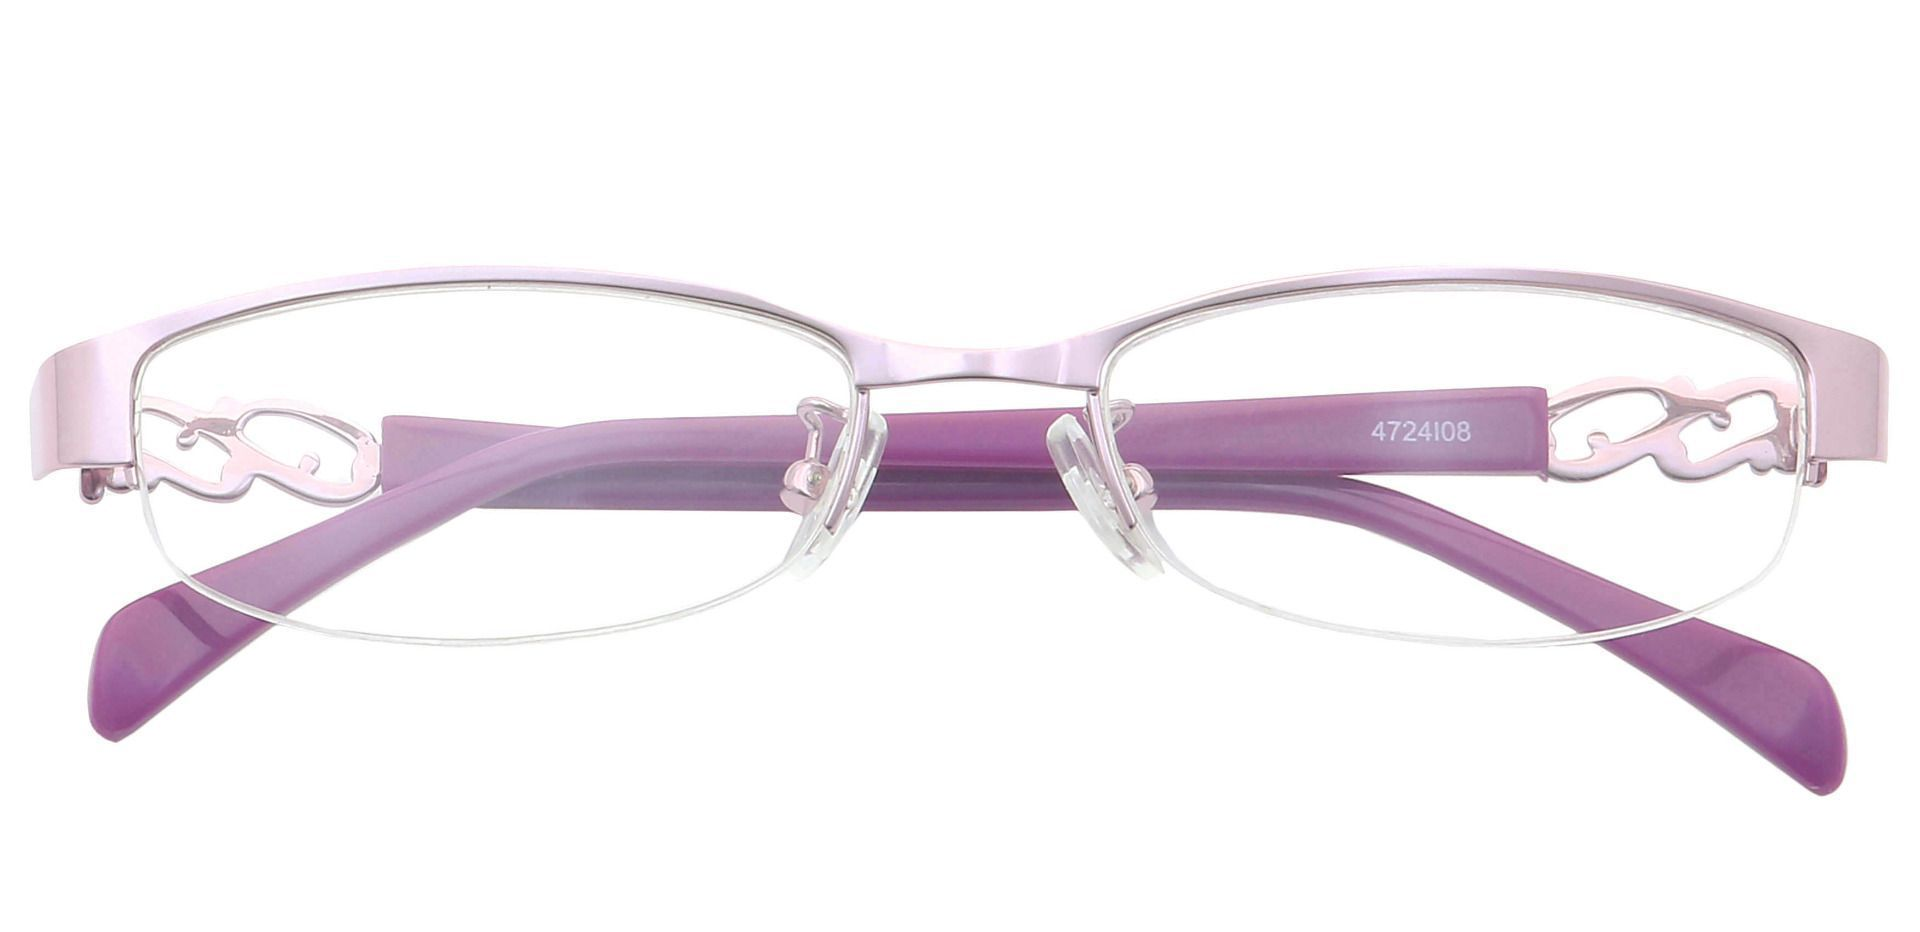 Danae Oval Eyeglasses Frame - Pink